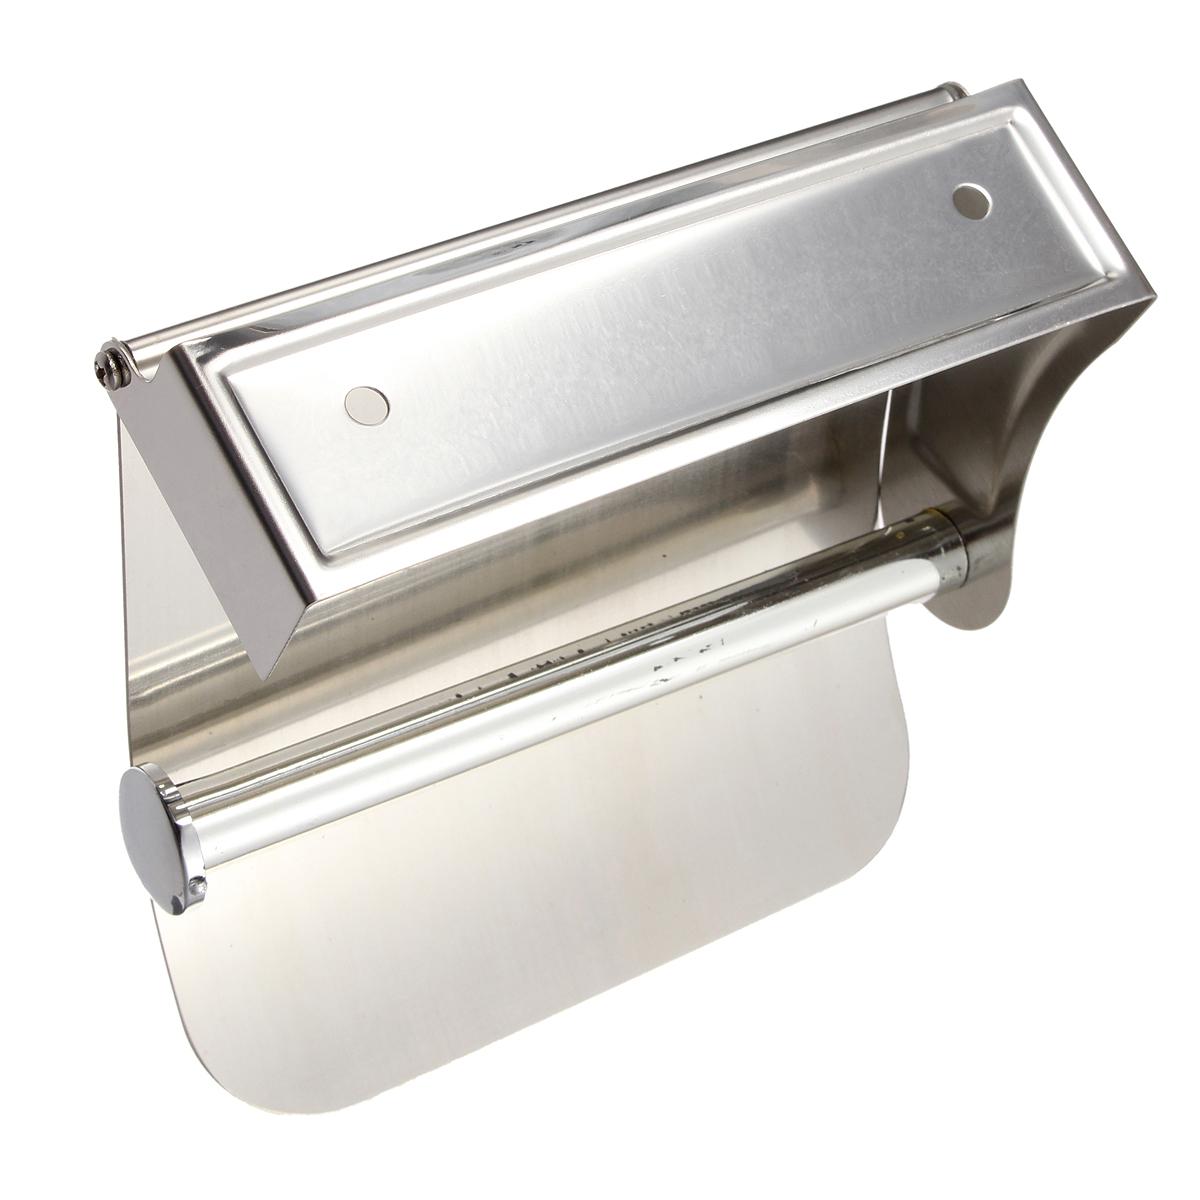 bathroom stainless steel wall mounted toilet paper holder roll tissue rack bath ebay. Black Bedroom Furniture Sets. Home Design Ideas